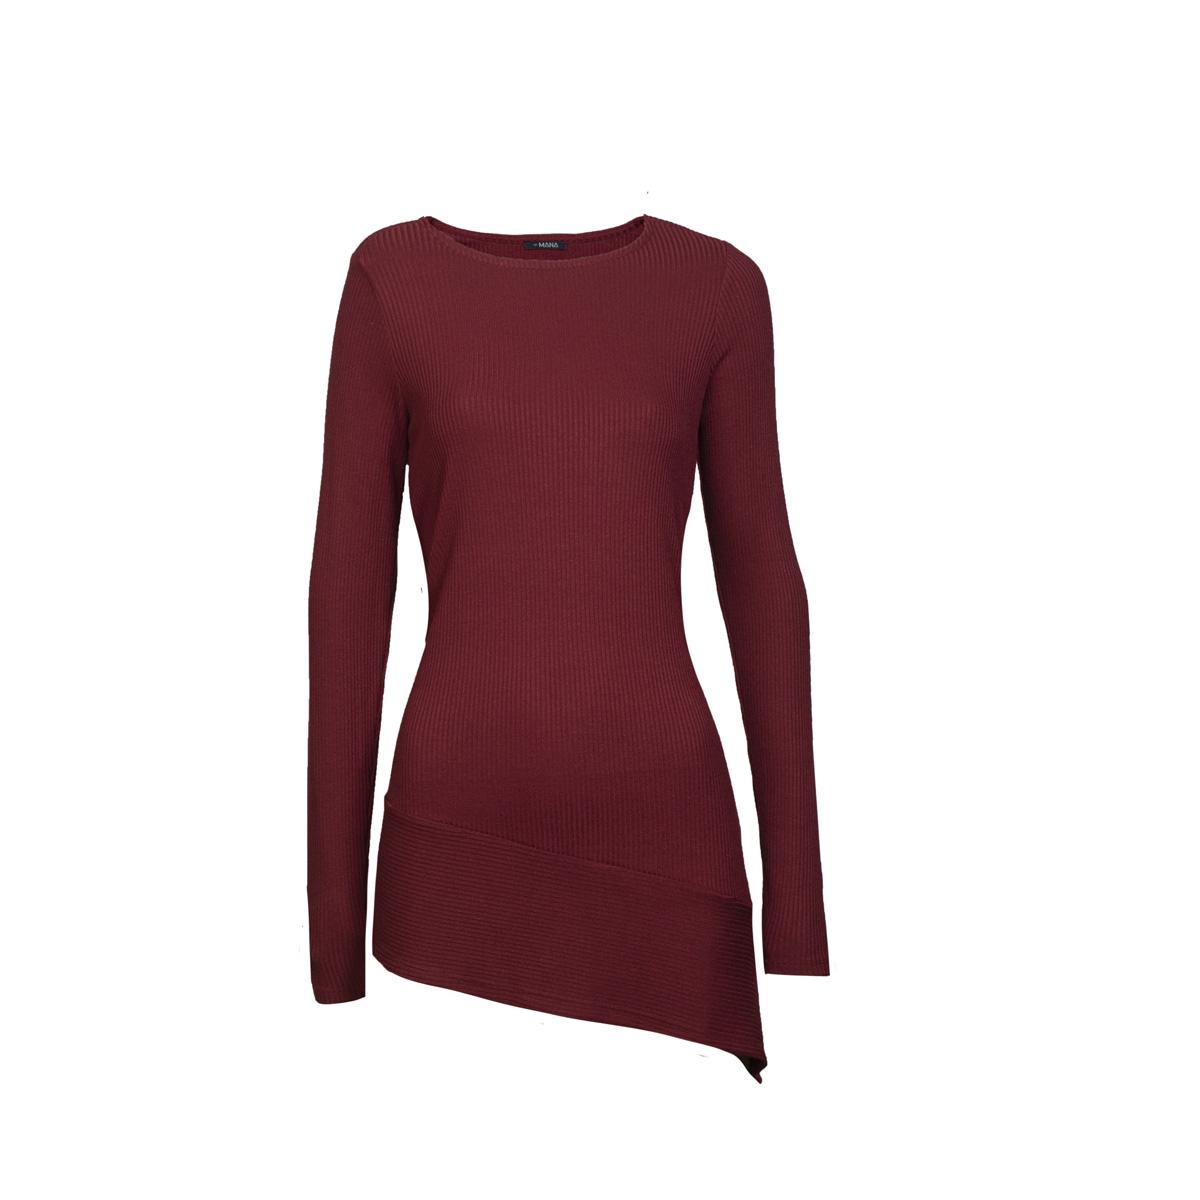 Ženska tunika, temno rdeča